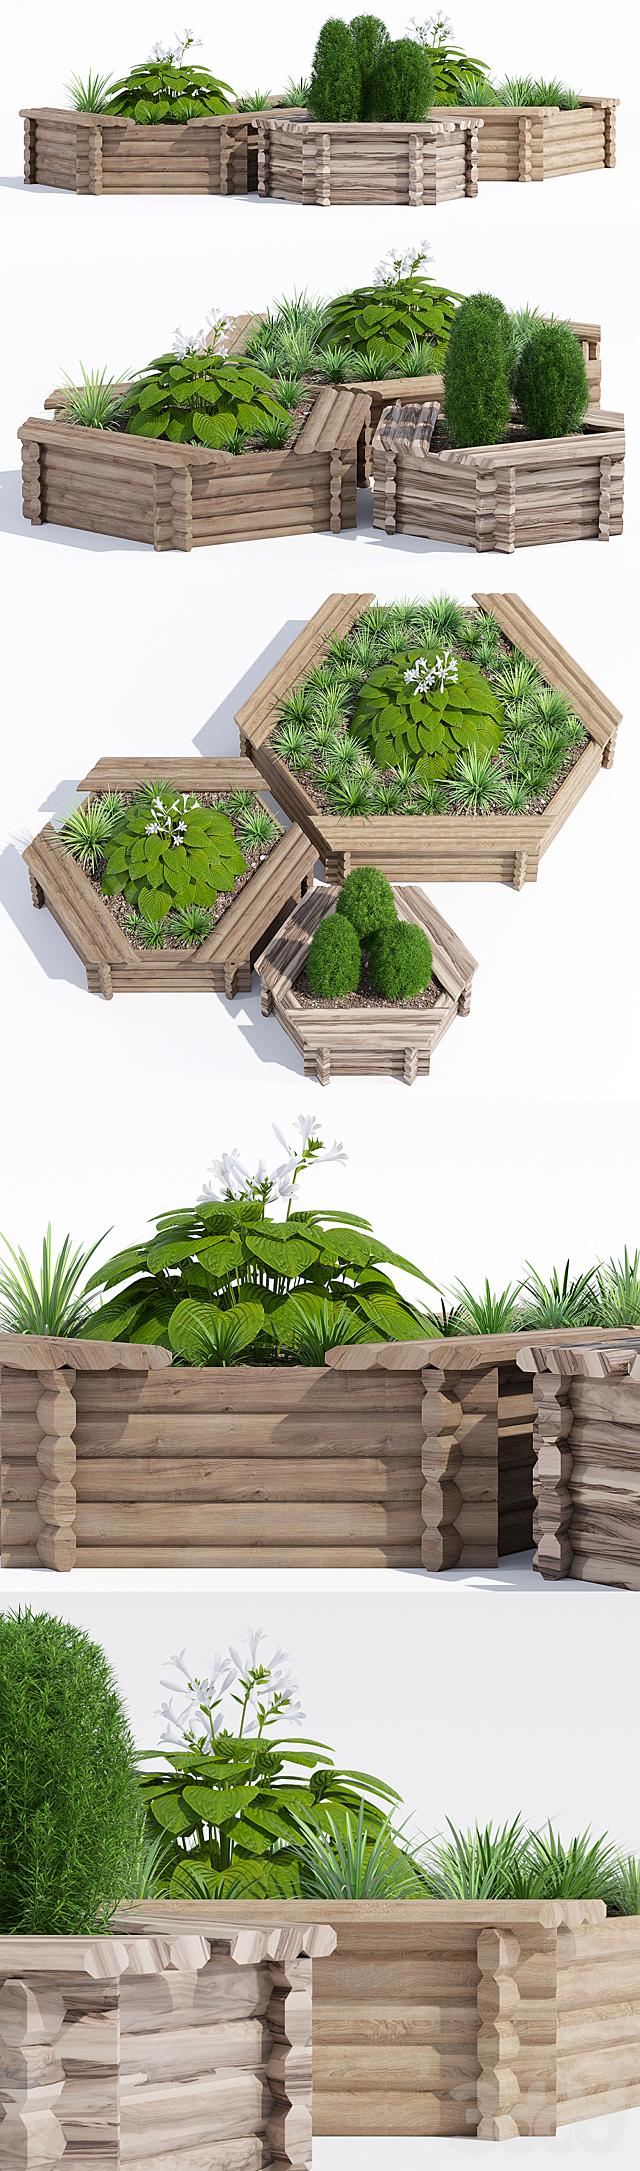 Hexagonal tree seat